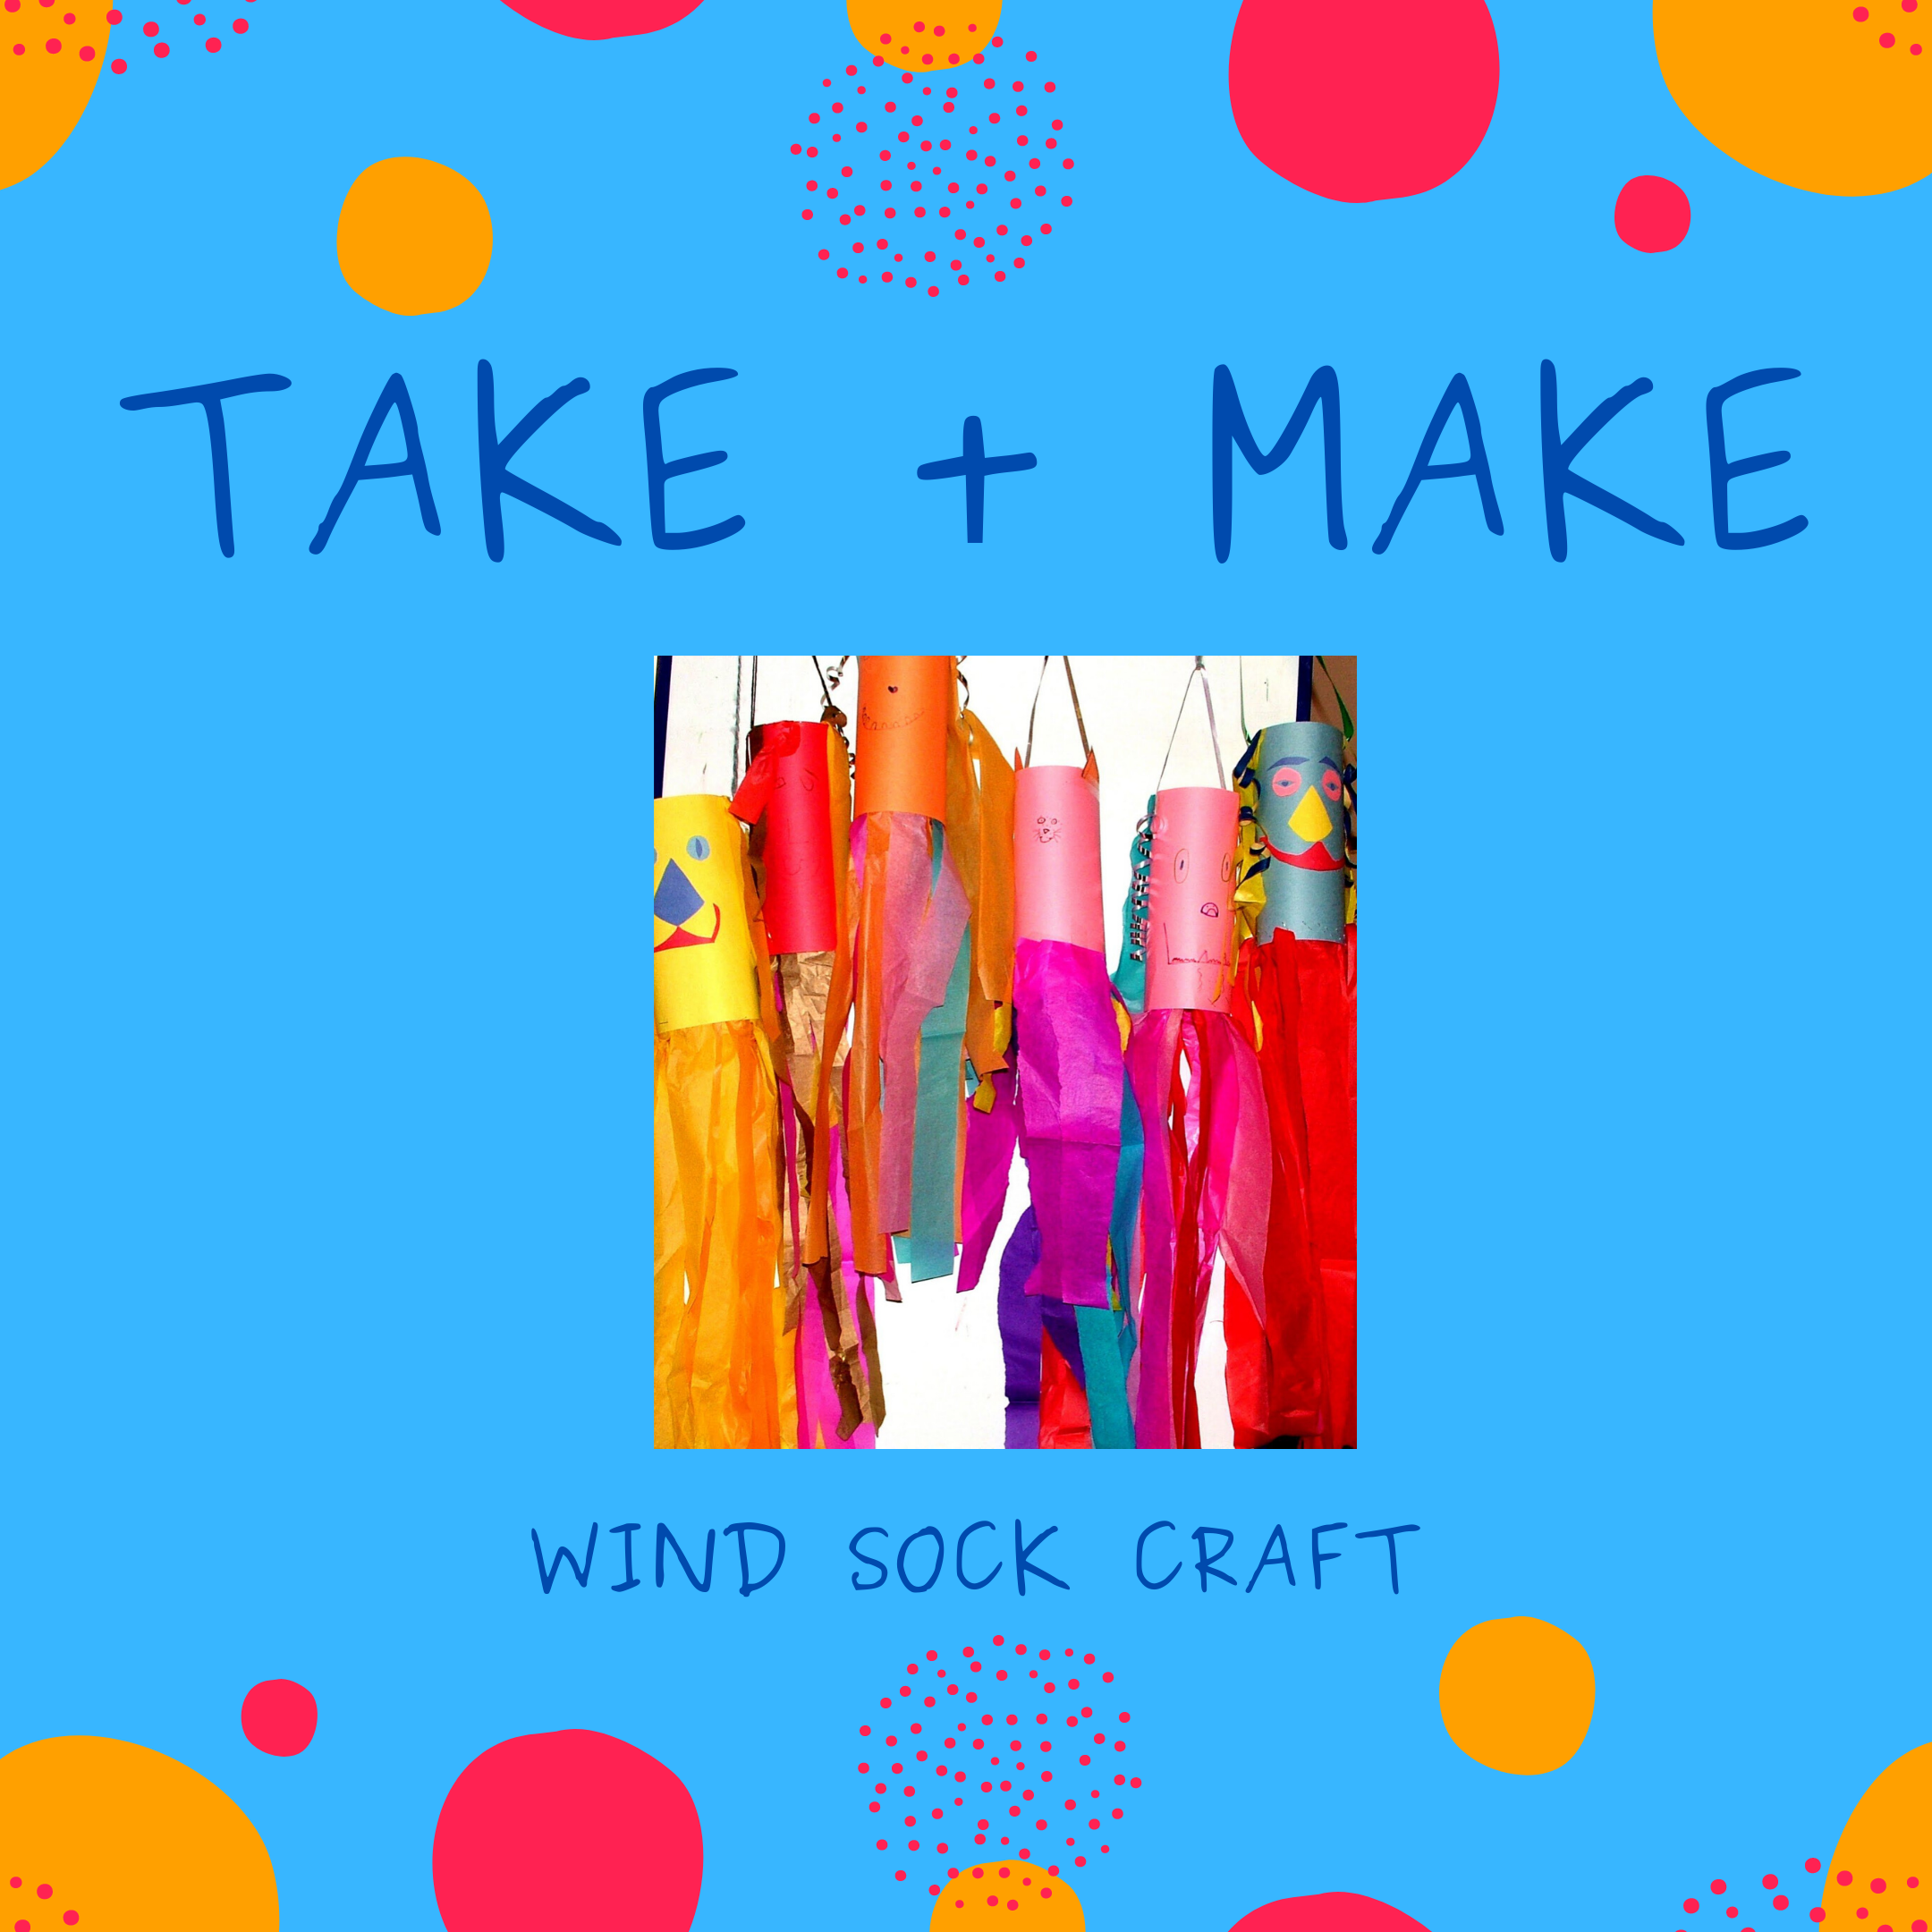 Take + Make: Wind sock craft (Ages 2-5)